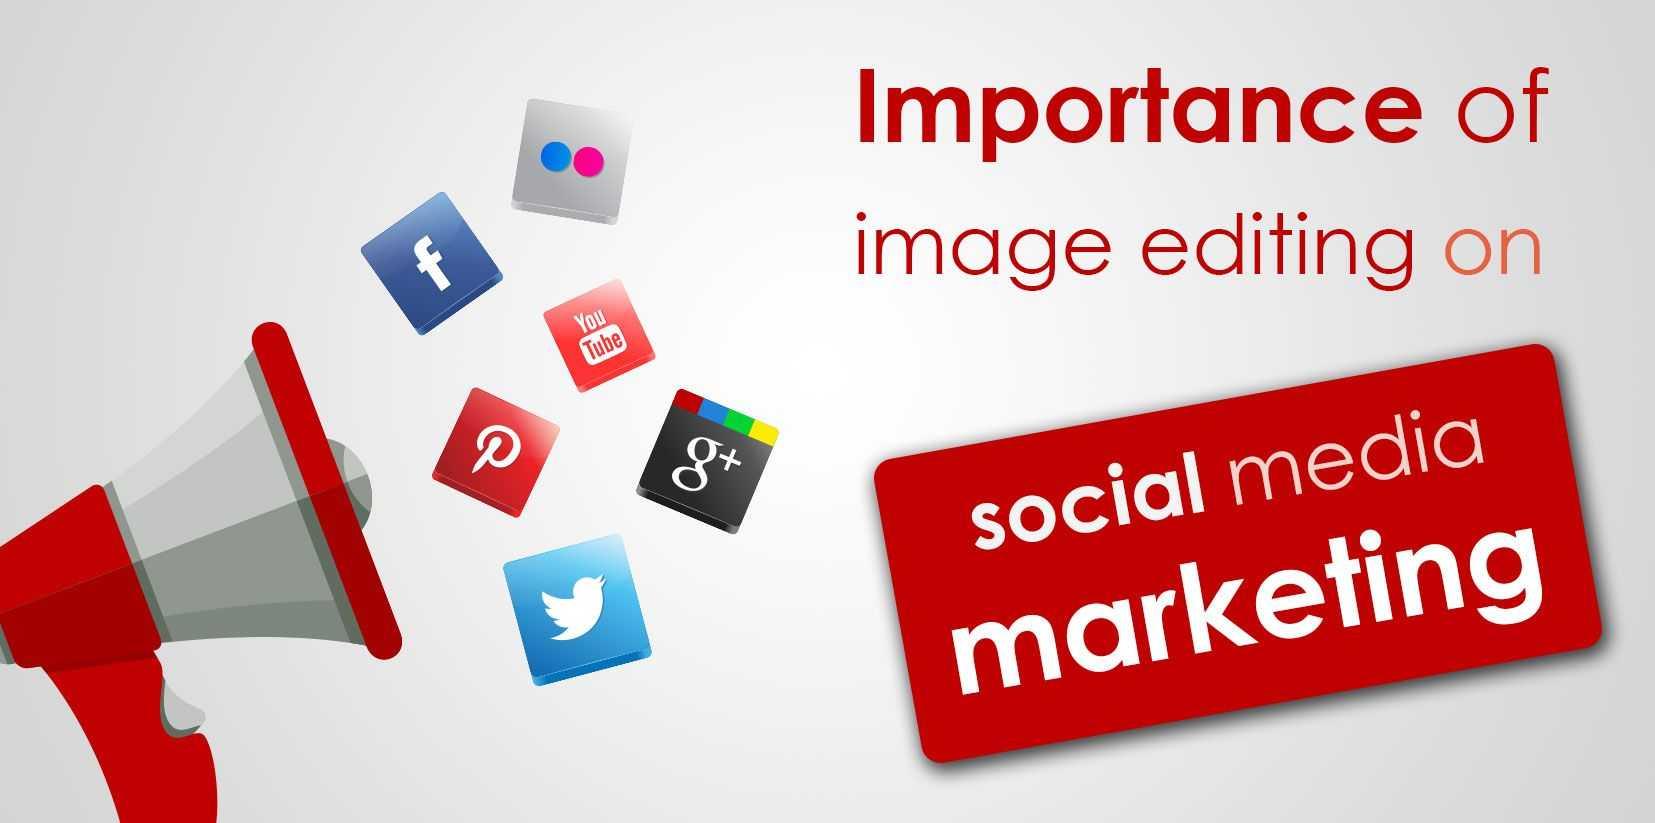 Importance-of-image-editing-on-social-media-marketing